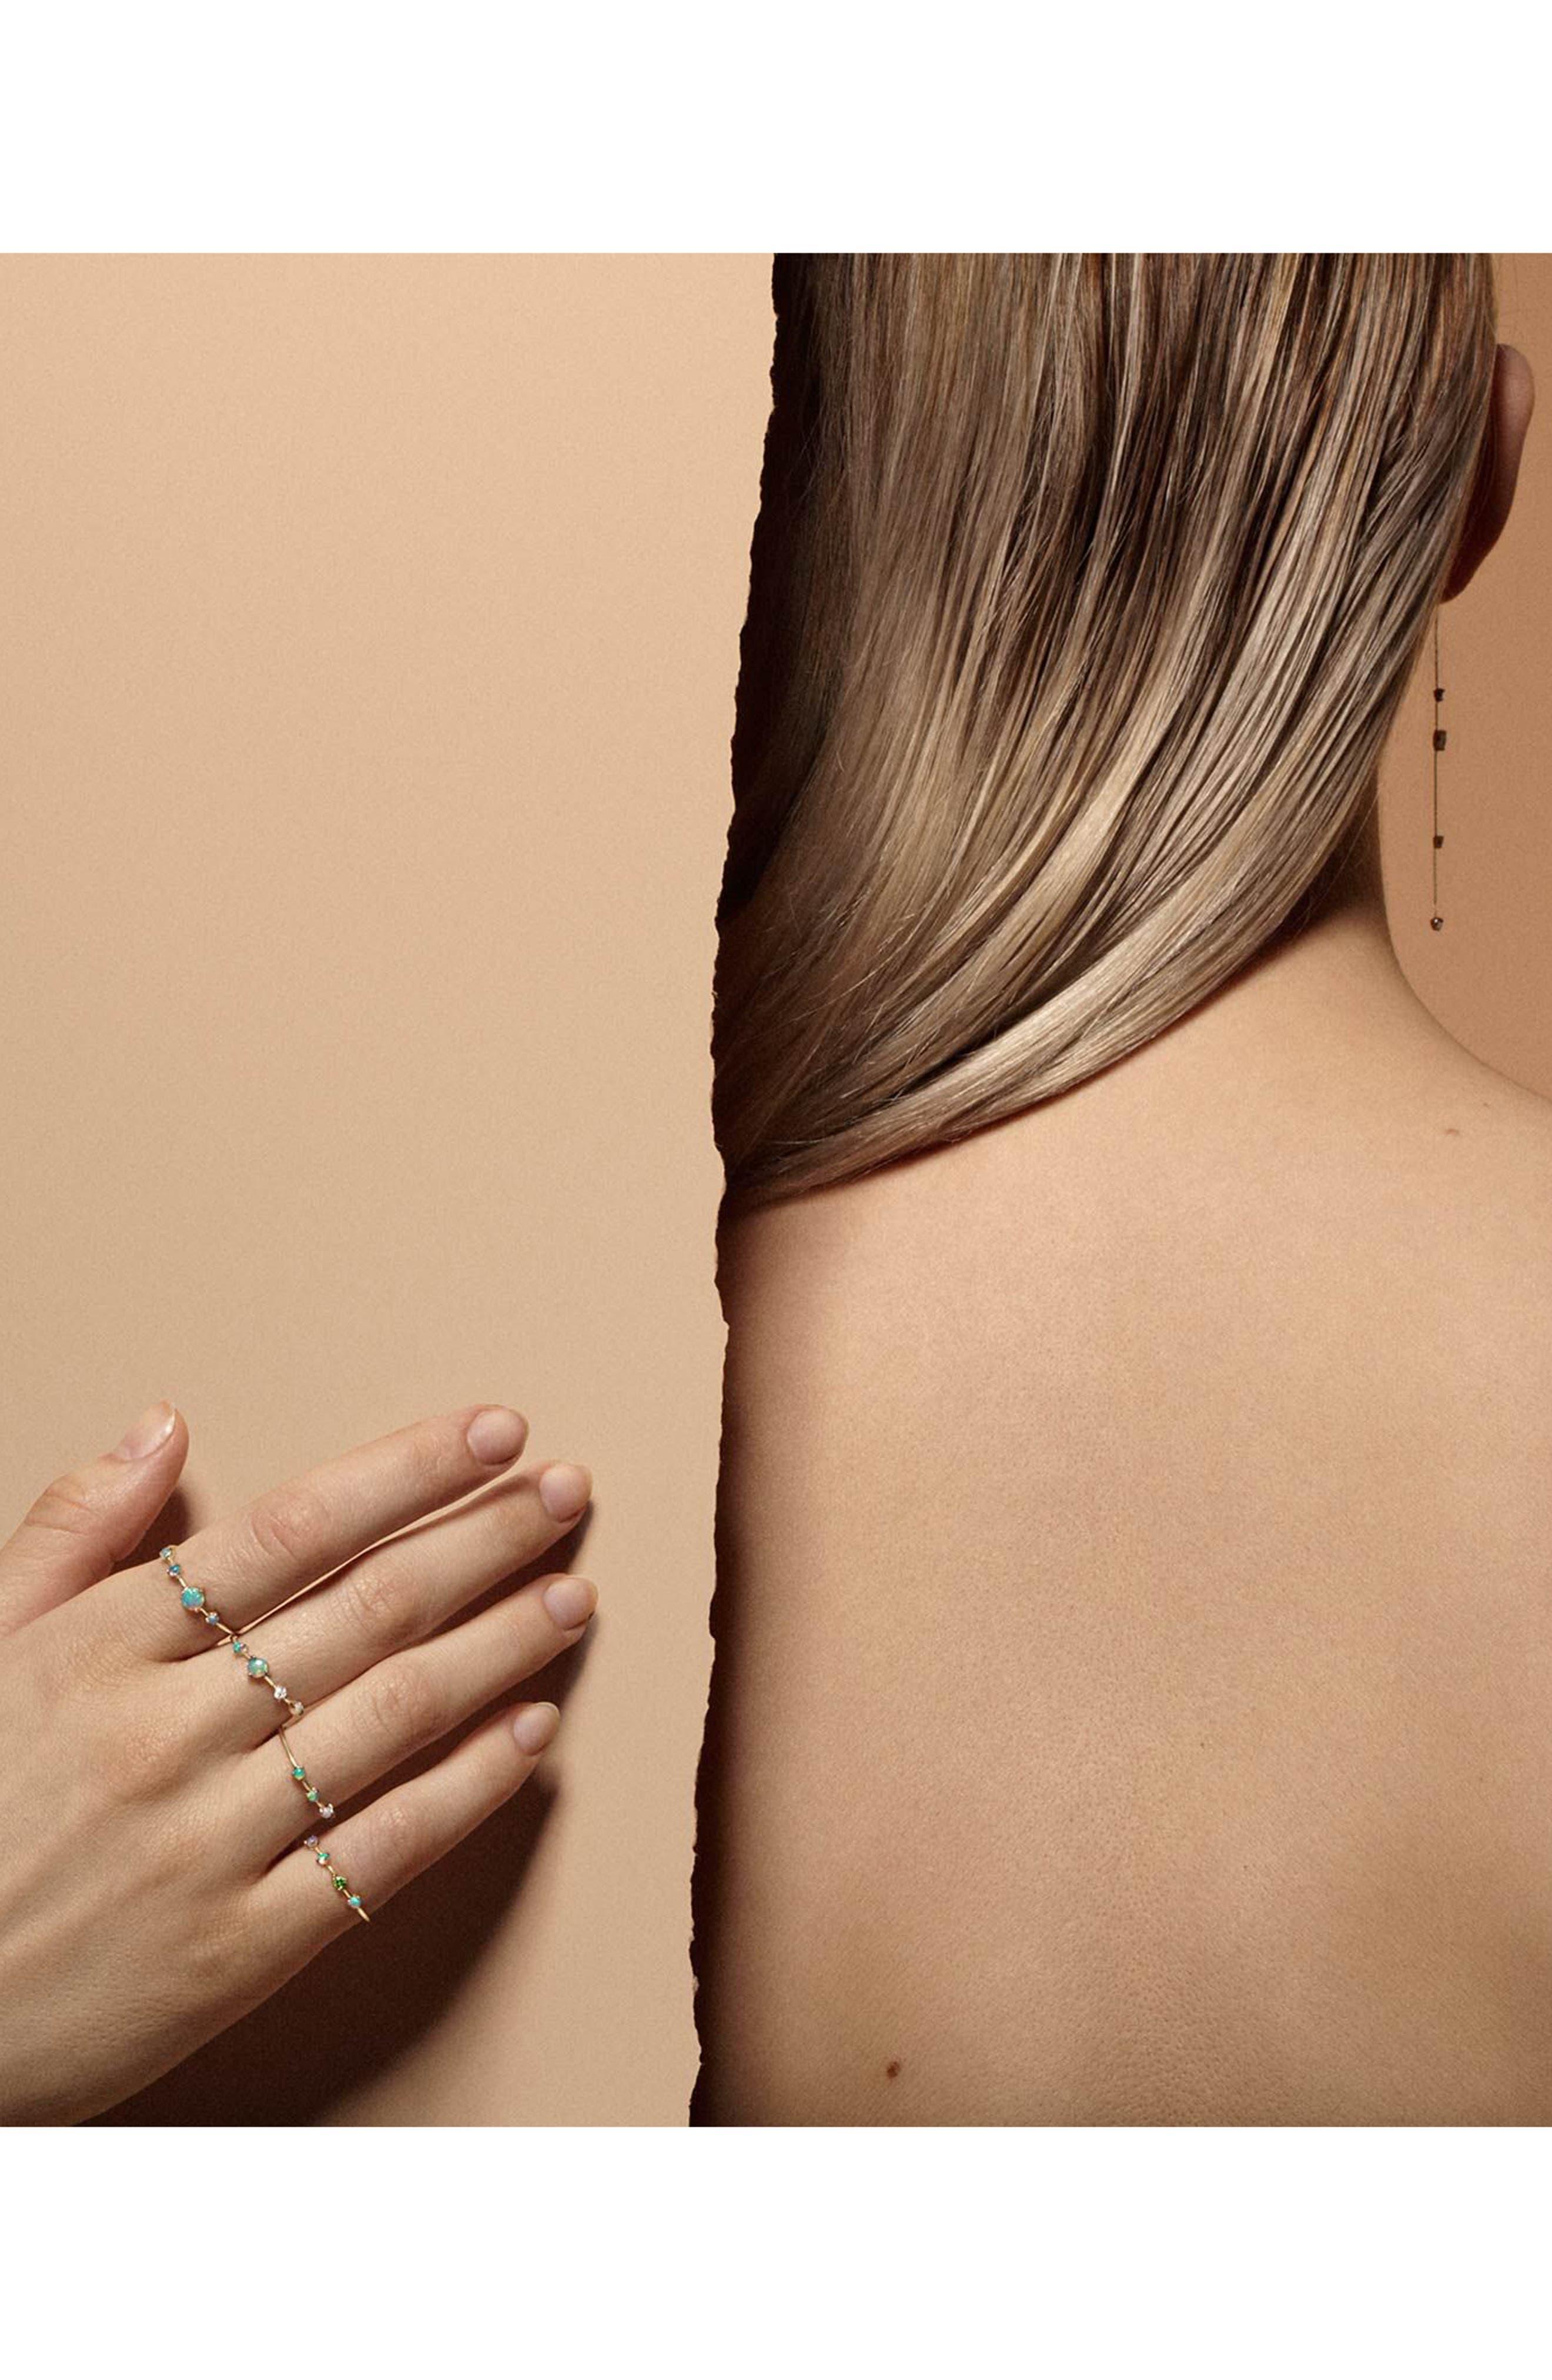 Linear Chain Earrings,                             Alternate thumbnail 2, color,                             Opal/ White Diamond